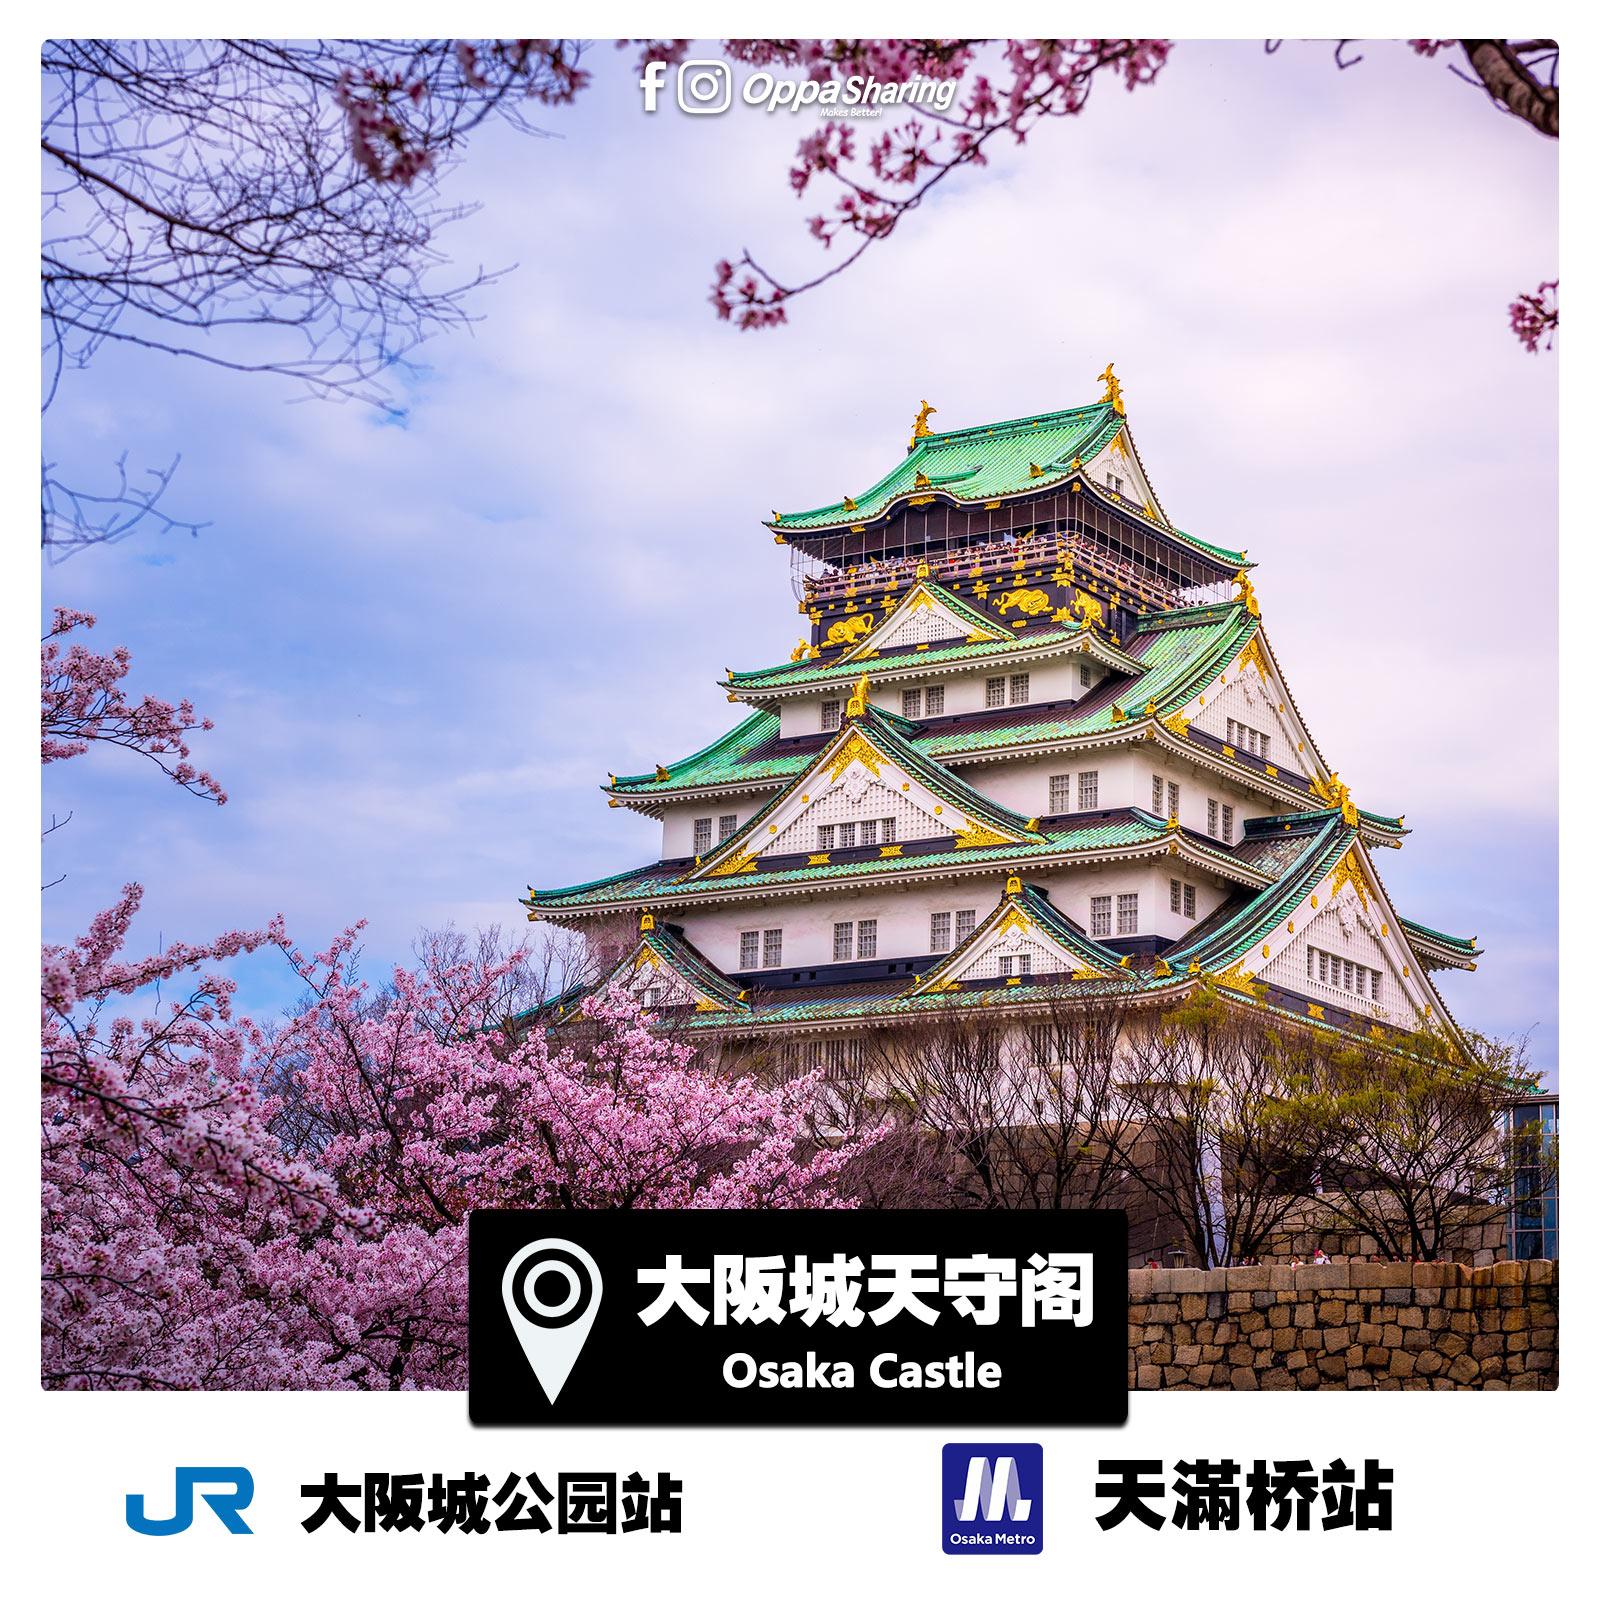 【Osaka大阪】10個必去景點!!! | Oppa Sharing